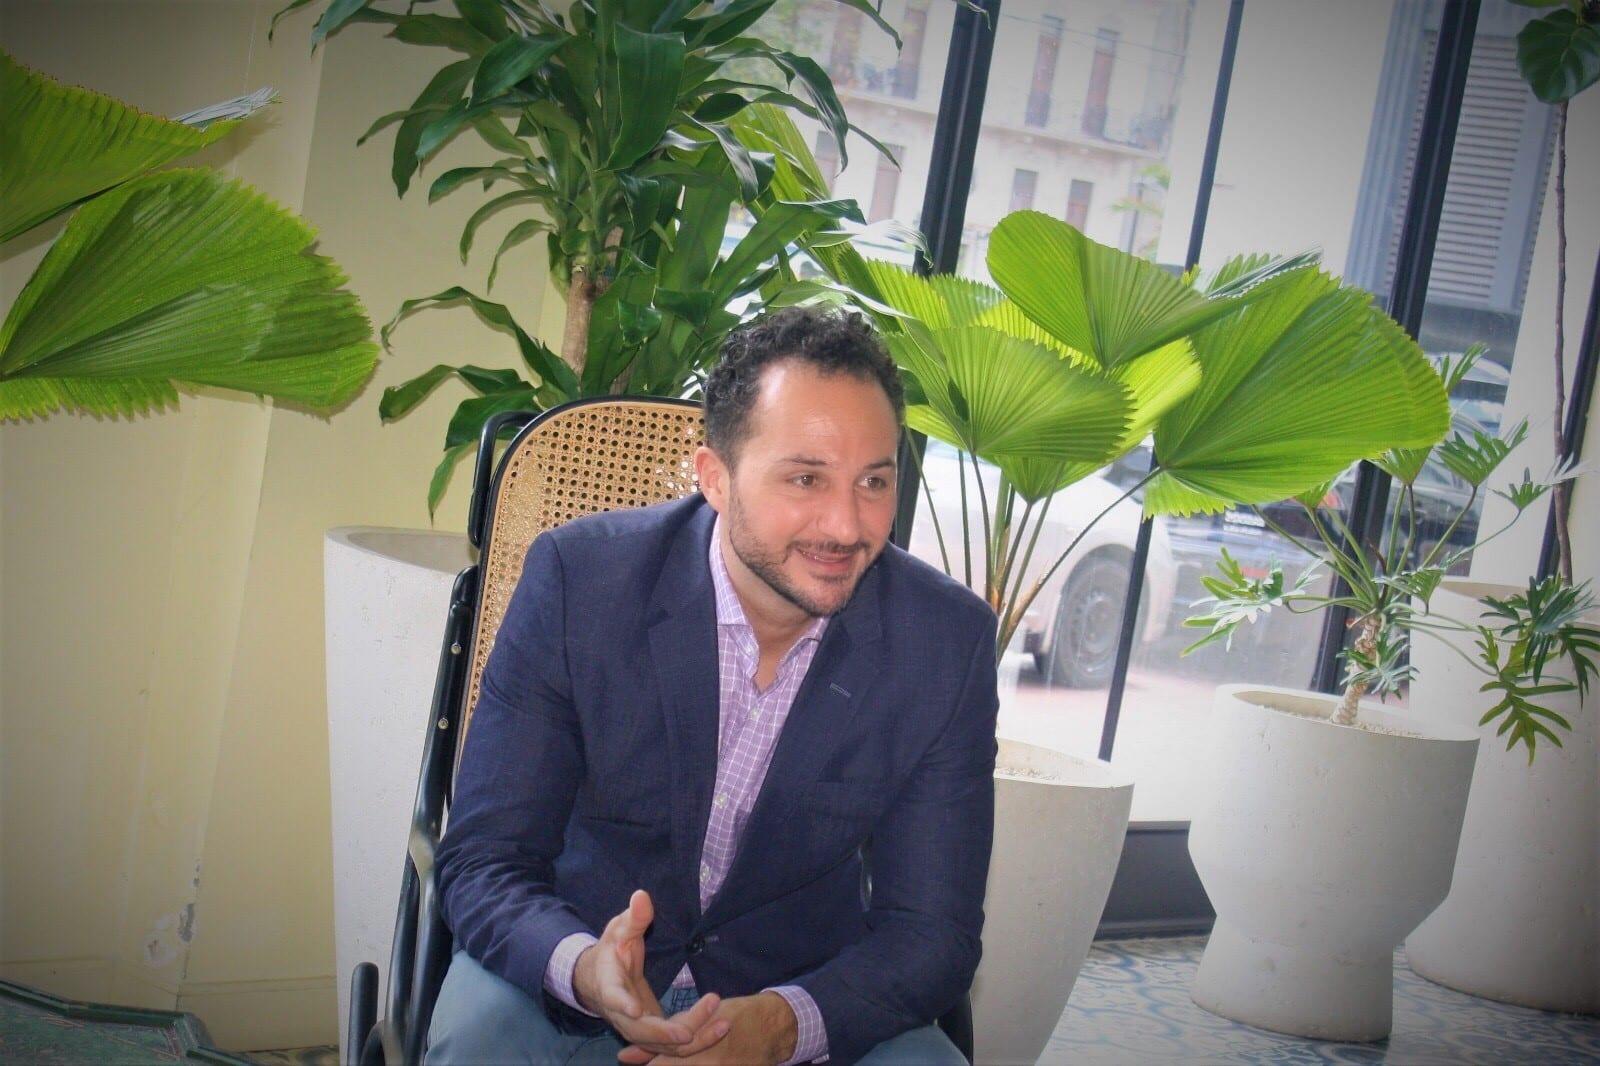 Michael Mirarchi